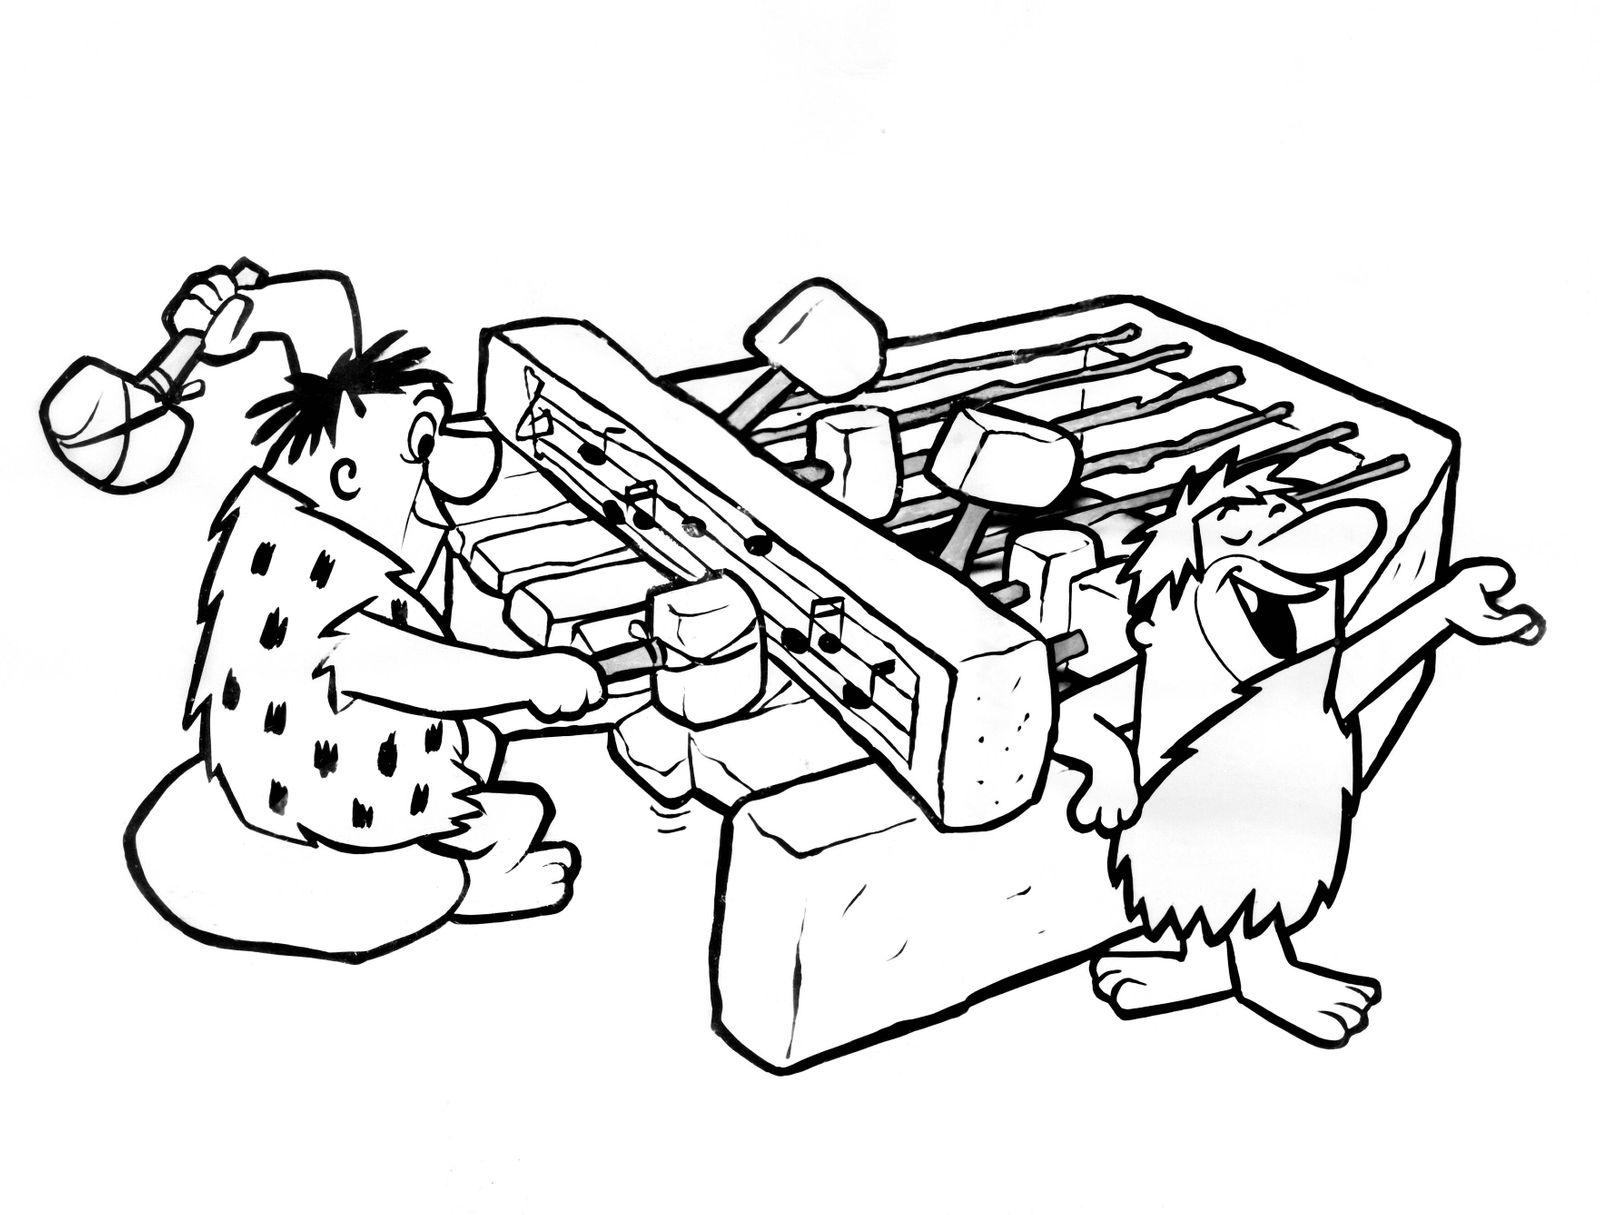 THE FLINTSTONES, Fred Flintstone, Barney Rubble, (early incarnations), 1960-66 Courtesy Everett Collection !ACHTUNG AUFN